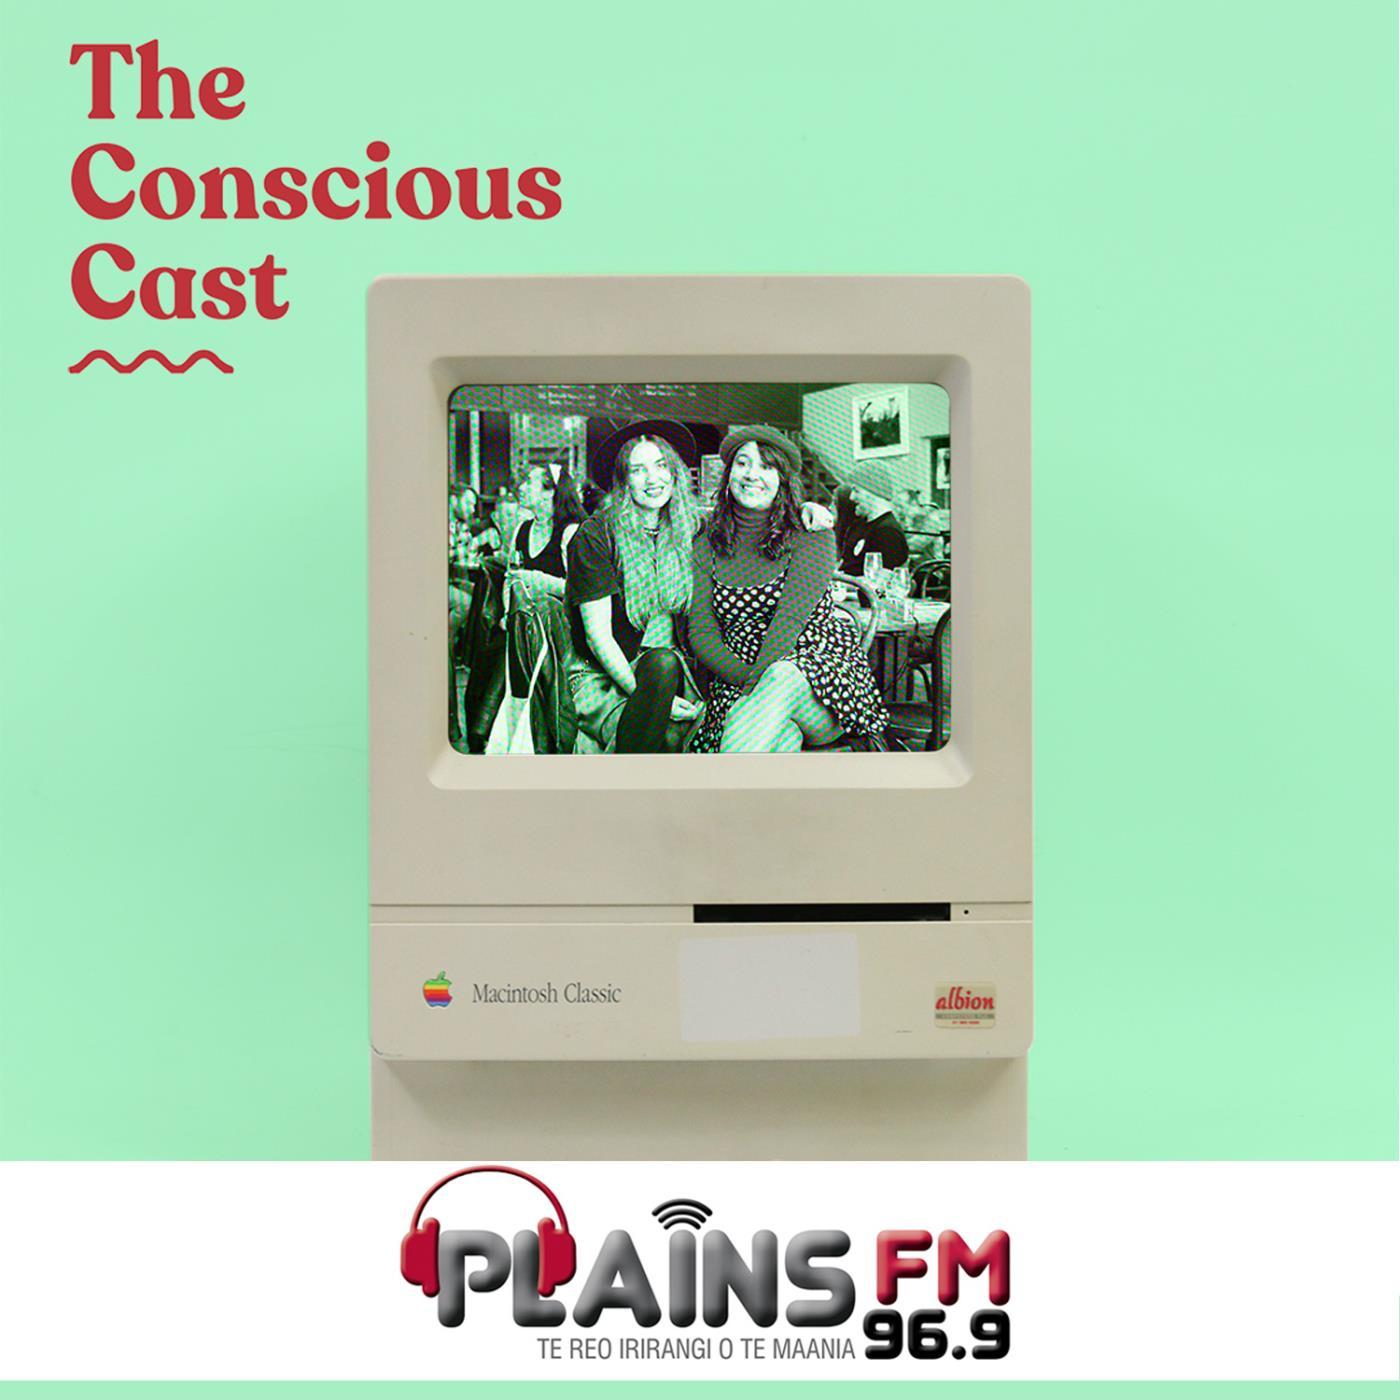 The Conscious Cast